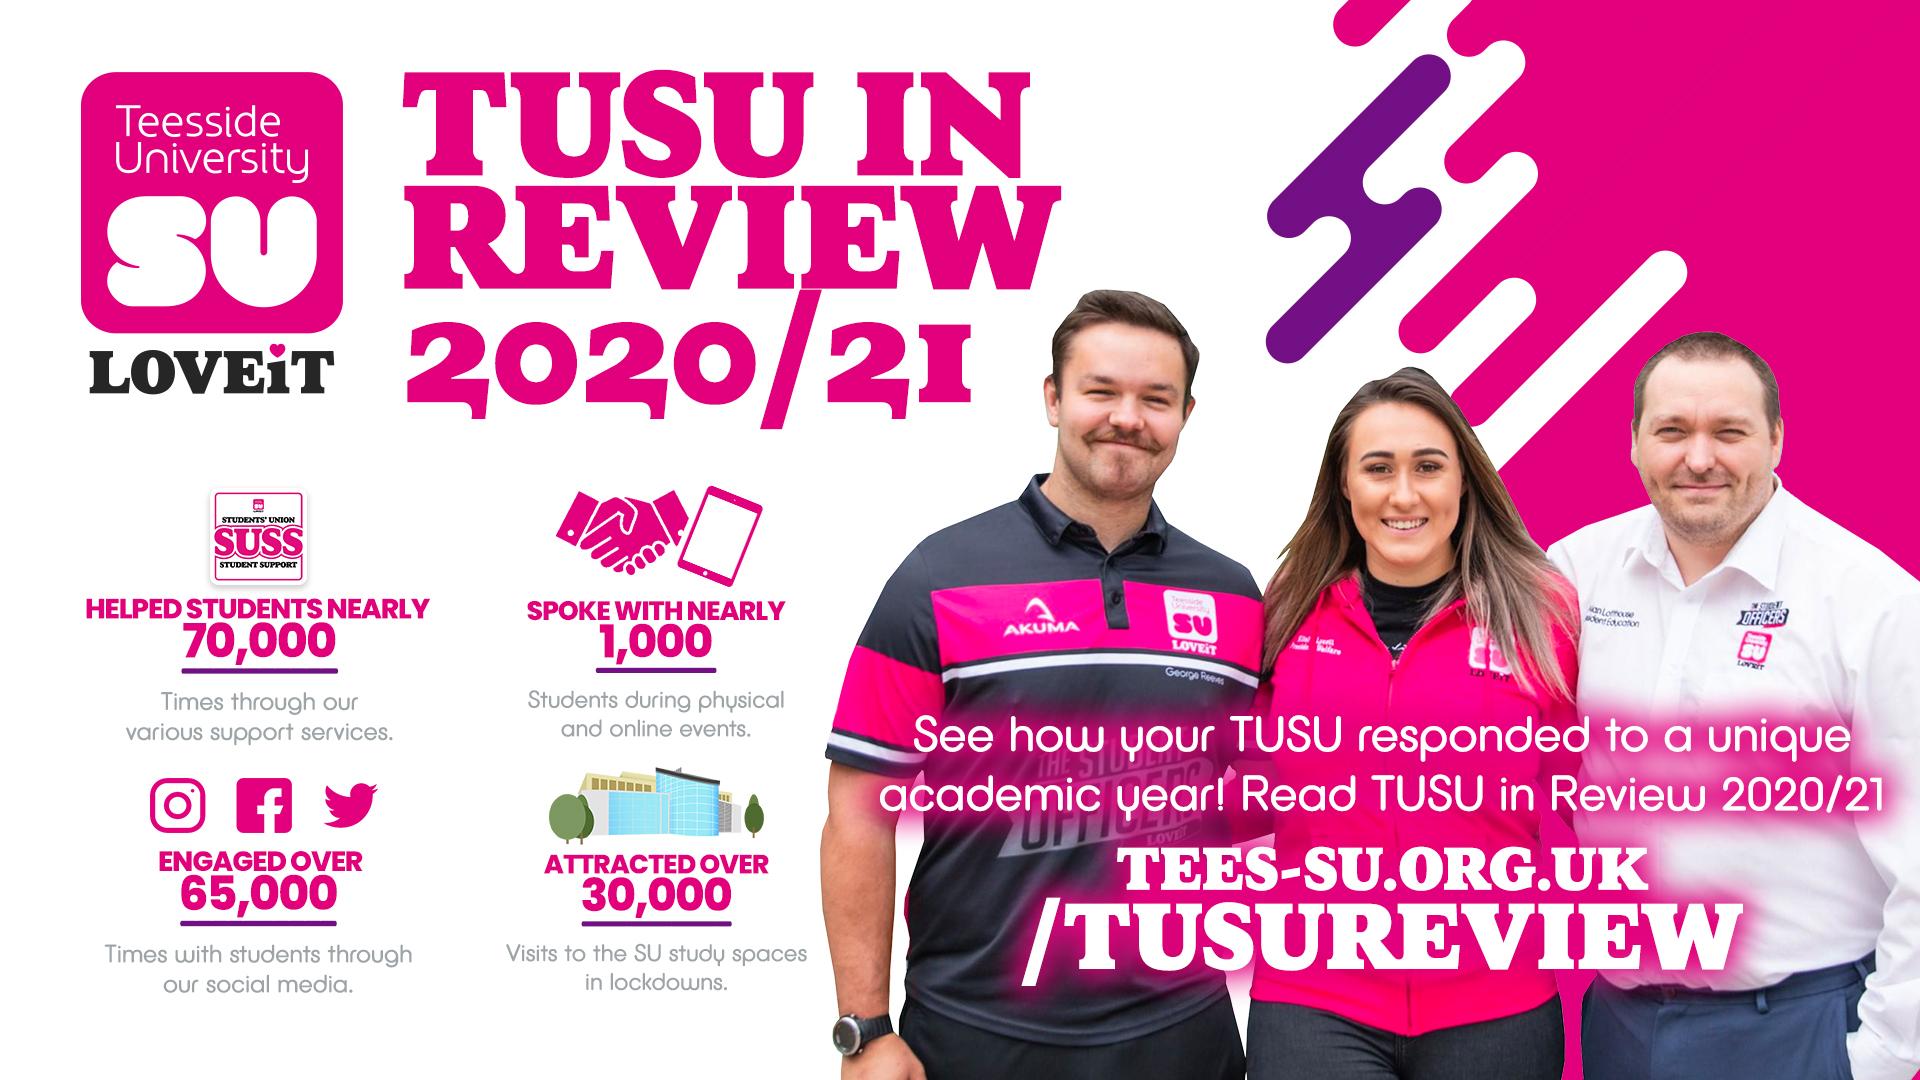 Tusu in review 2020 21 plasma